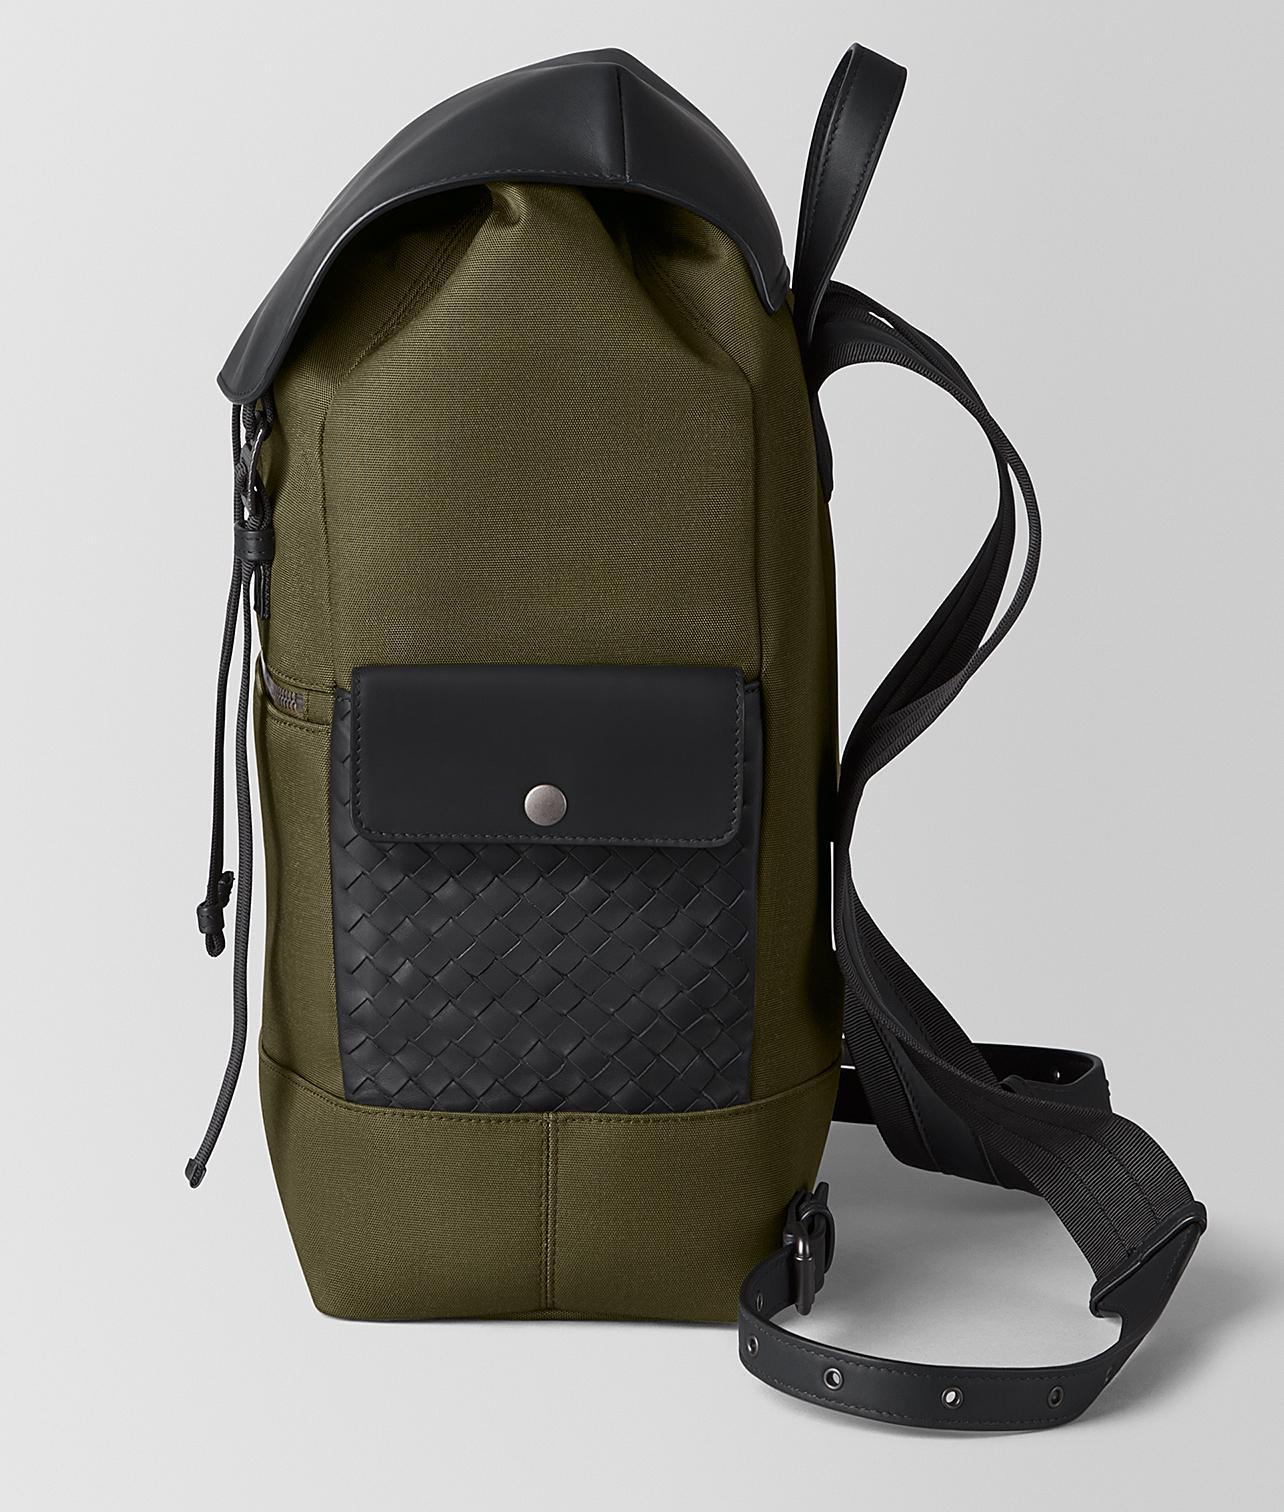 Lyst - Bottega Veneta Sassolungo Backpack In Hi-tech Canvas And Matte Calf  Leather for Men f5024301c5c5d